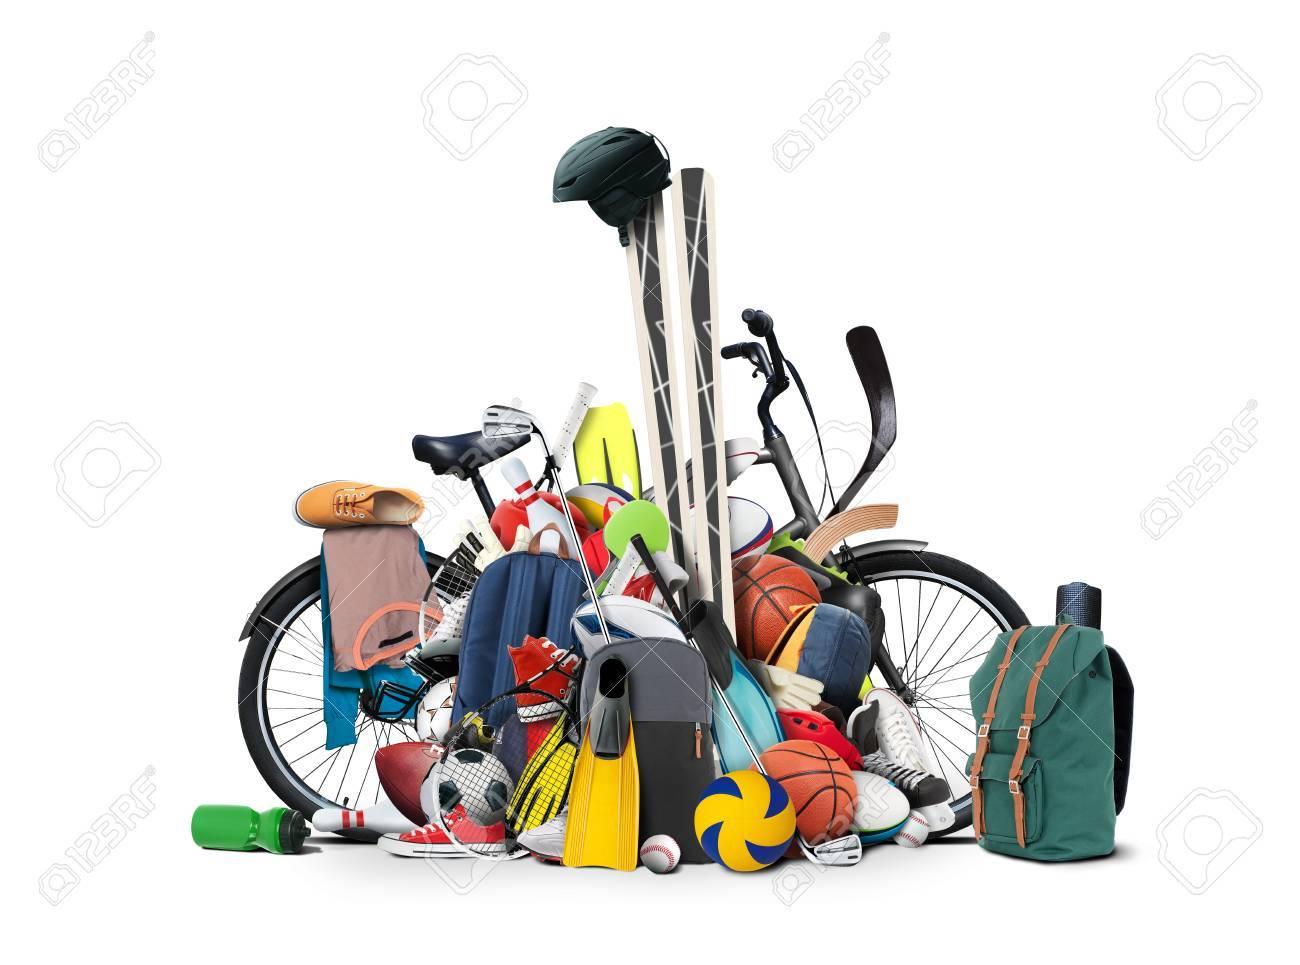 Sports equipment has fallen down in a heap - 60672665